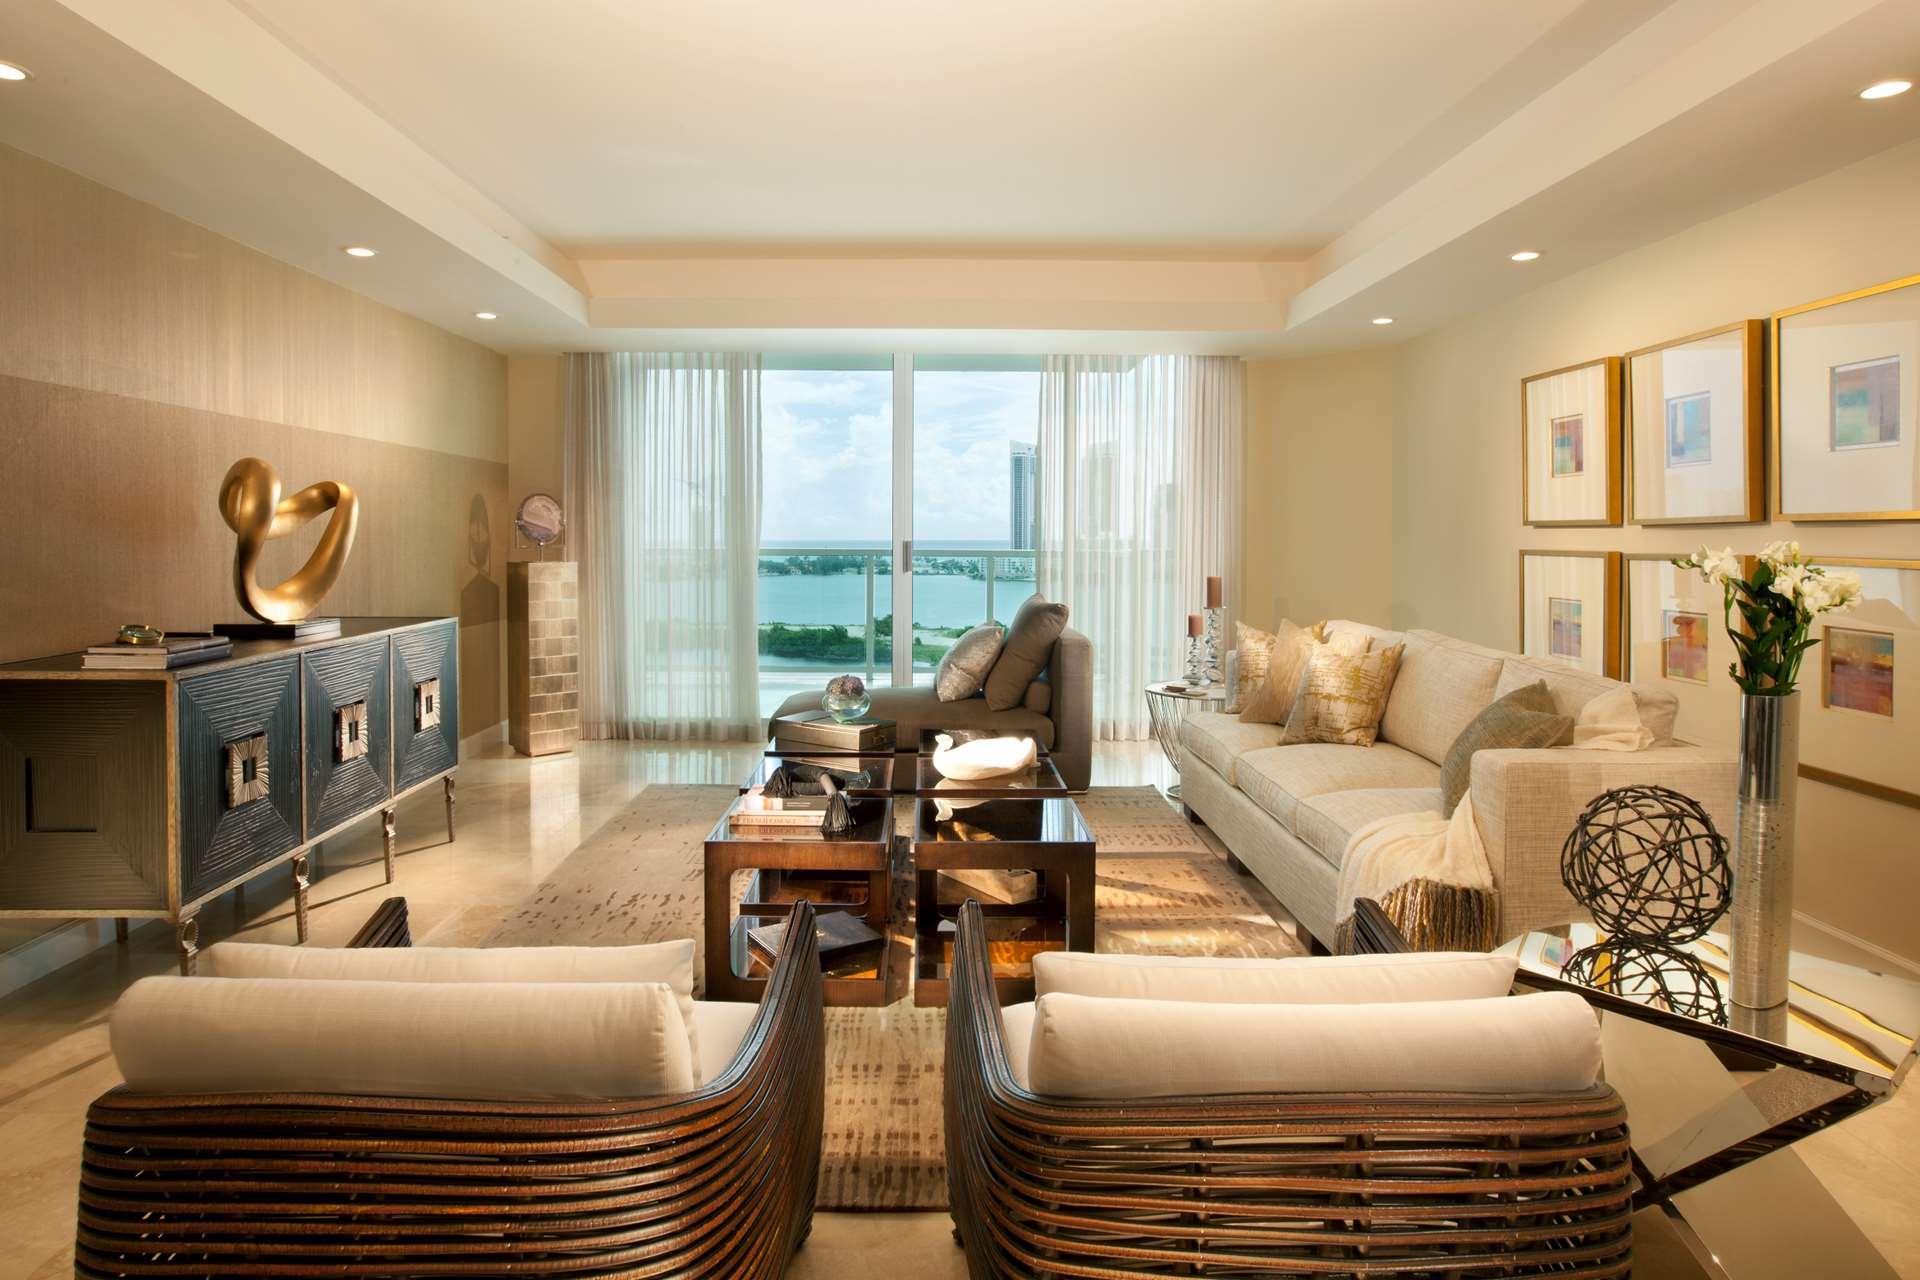 Miami Interior Design Living Room